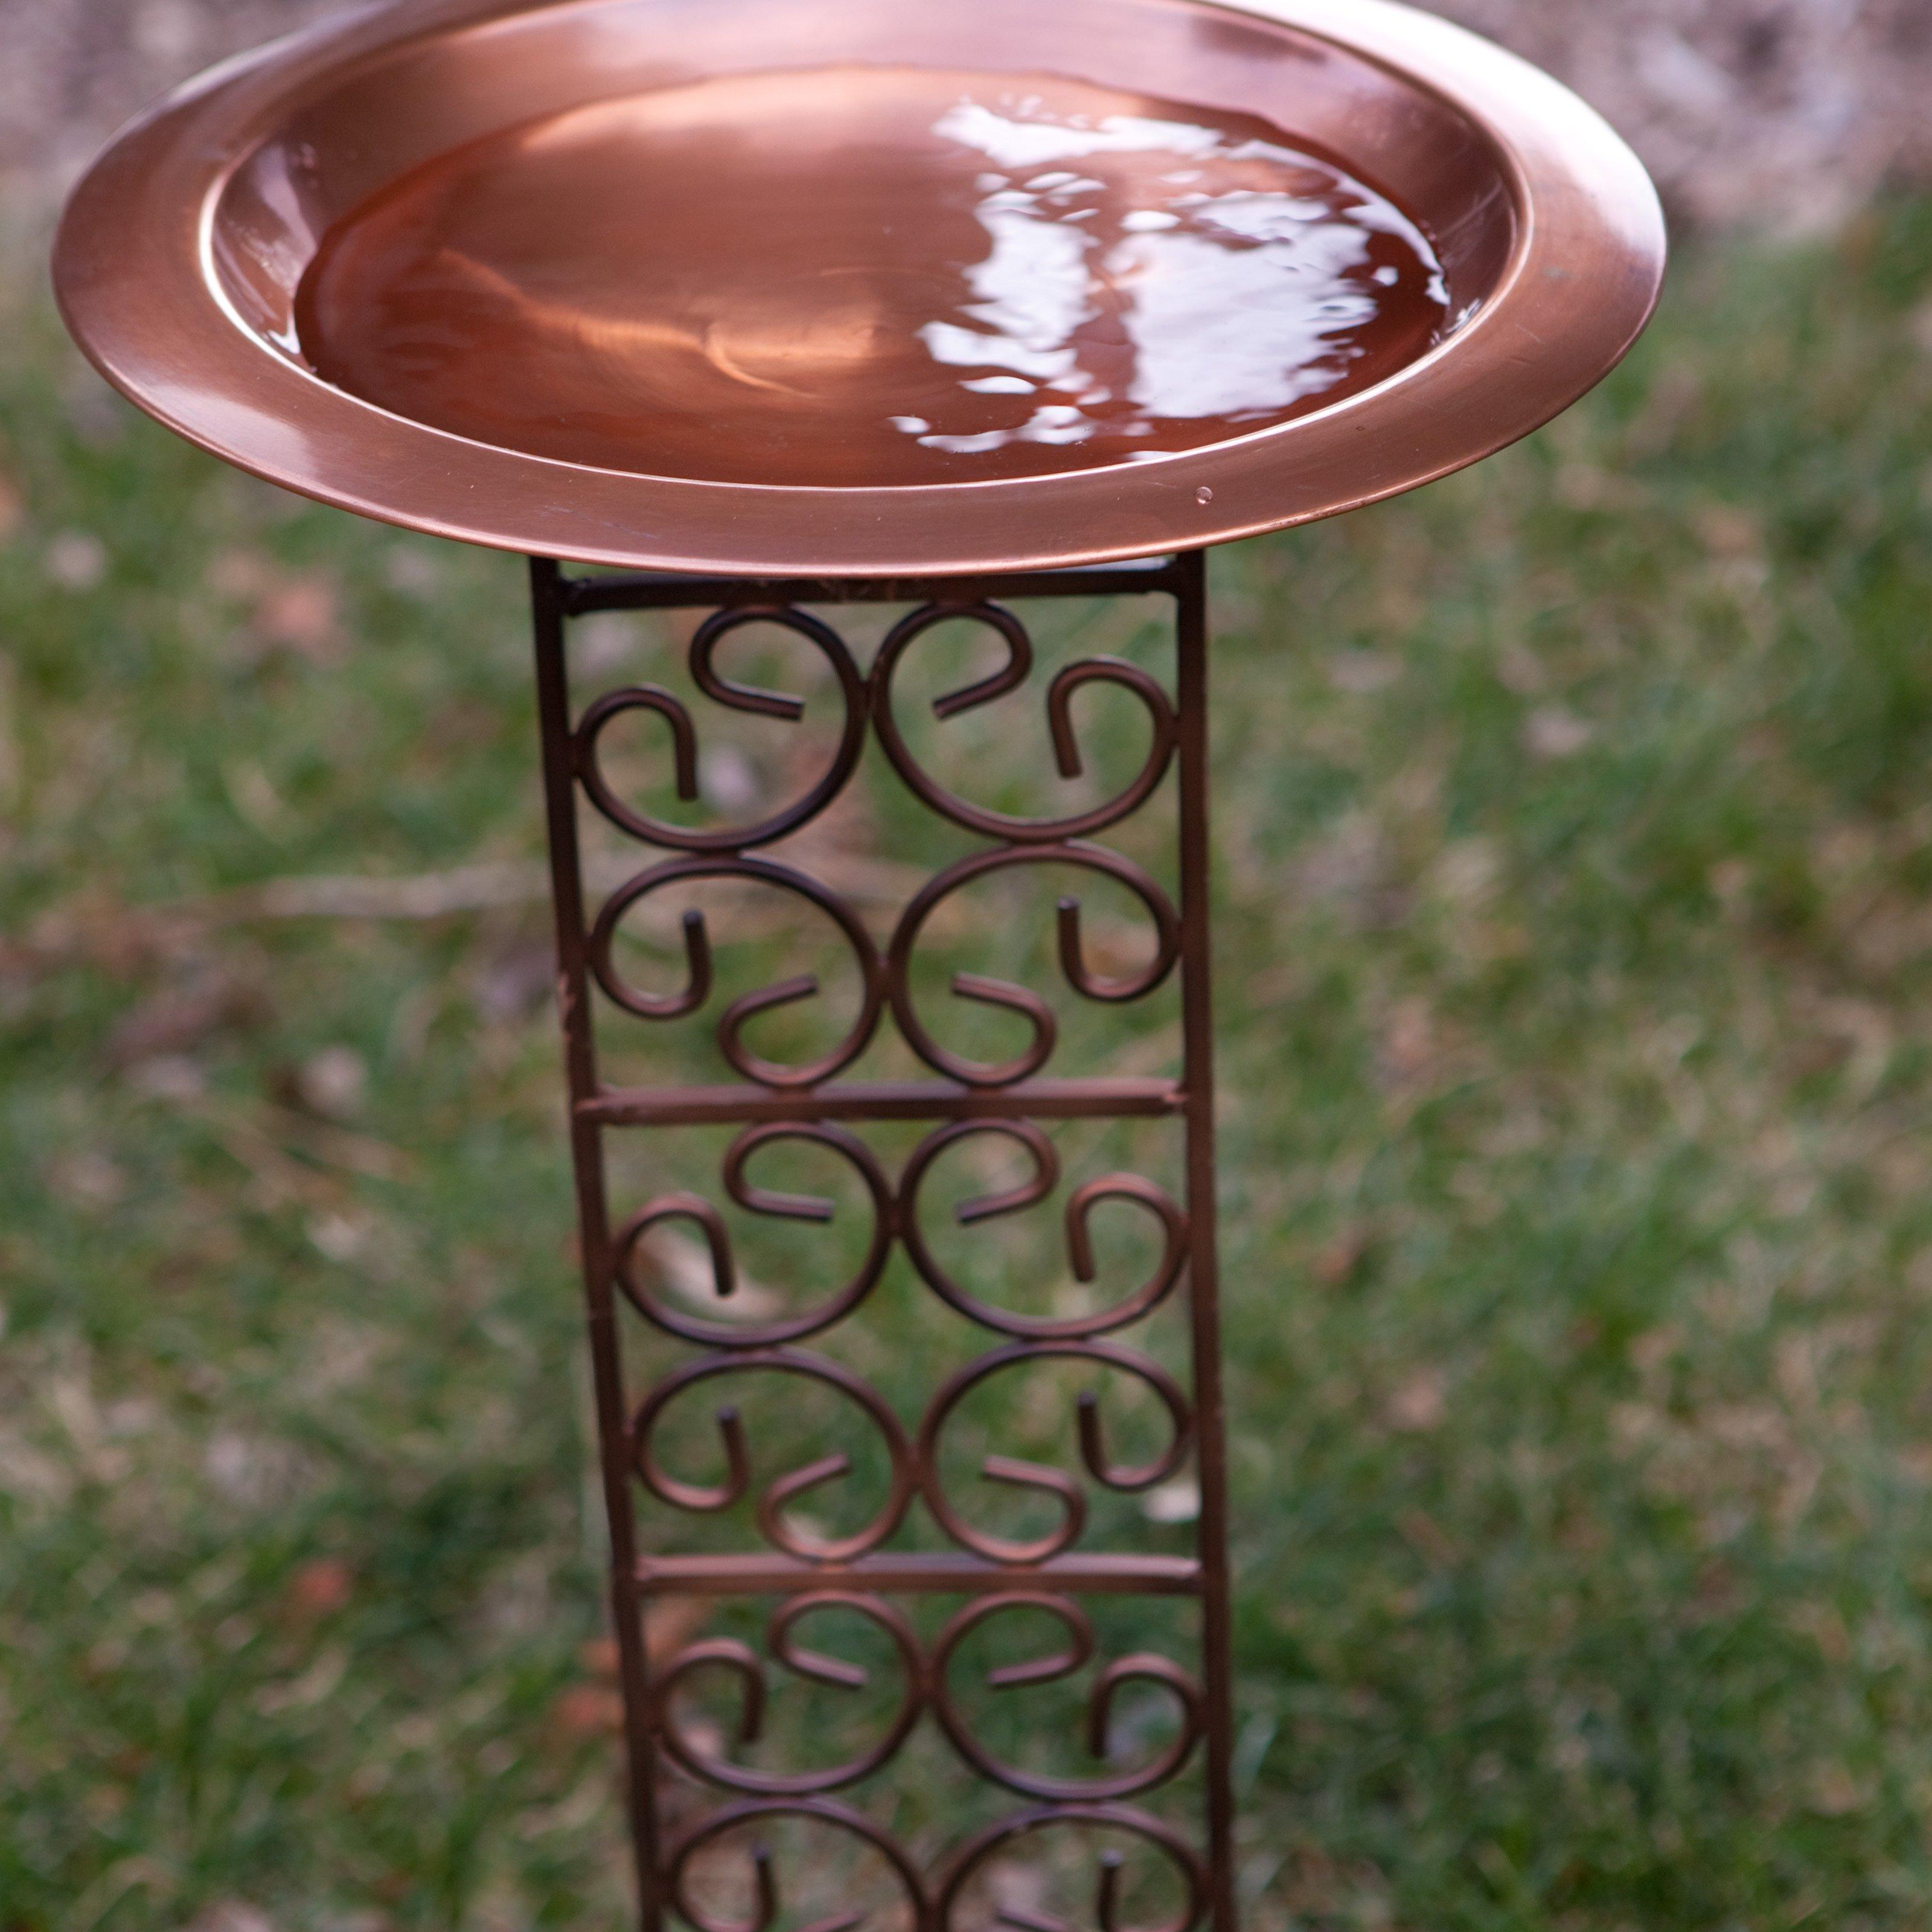 Classic Copper Bird Bath Bowl with Jalousie Stake